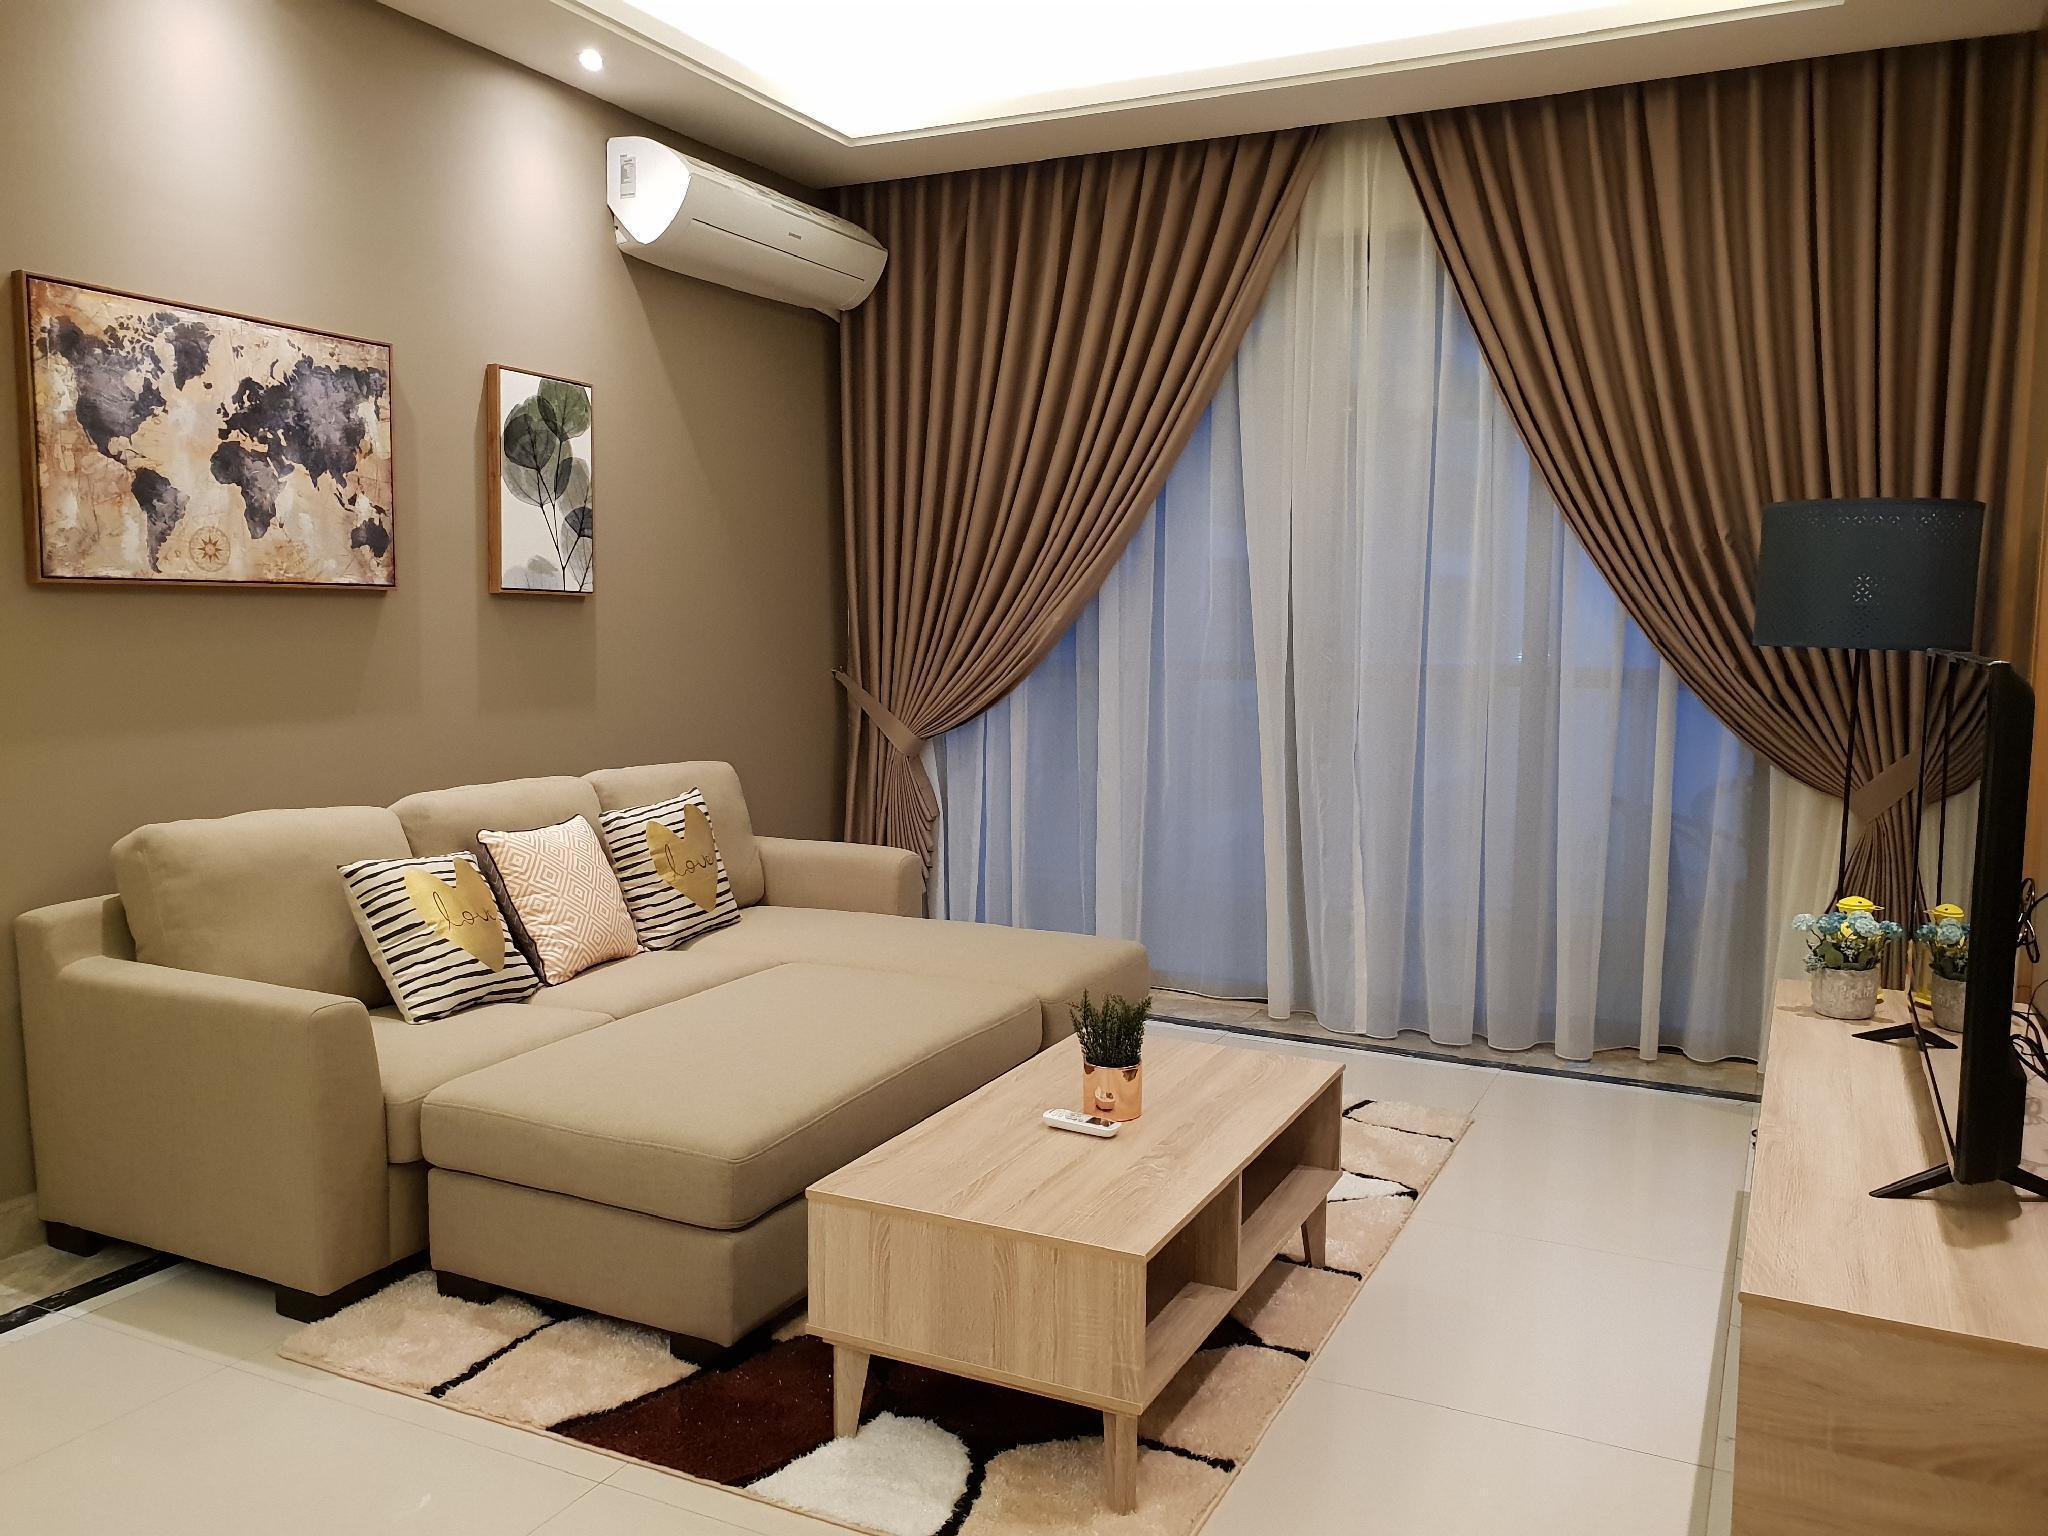 Luxury @ RandF Princess Cove Johor CIQ 6 PAX